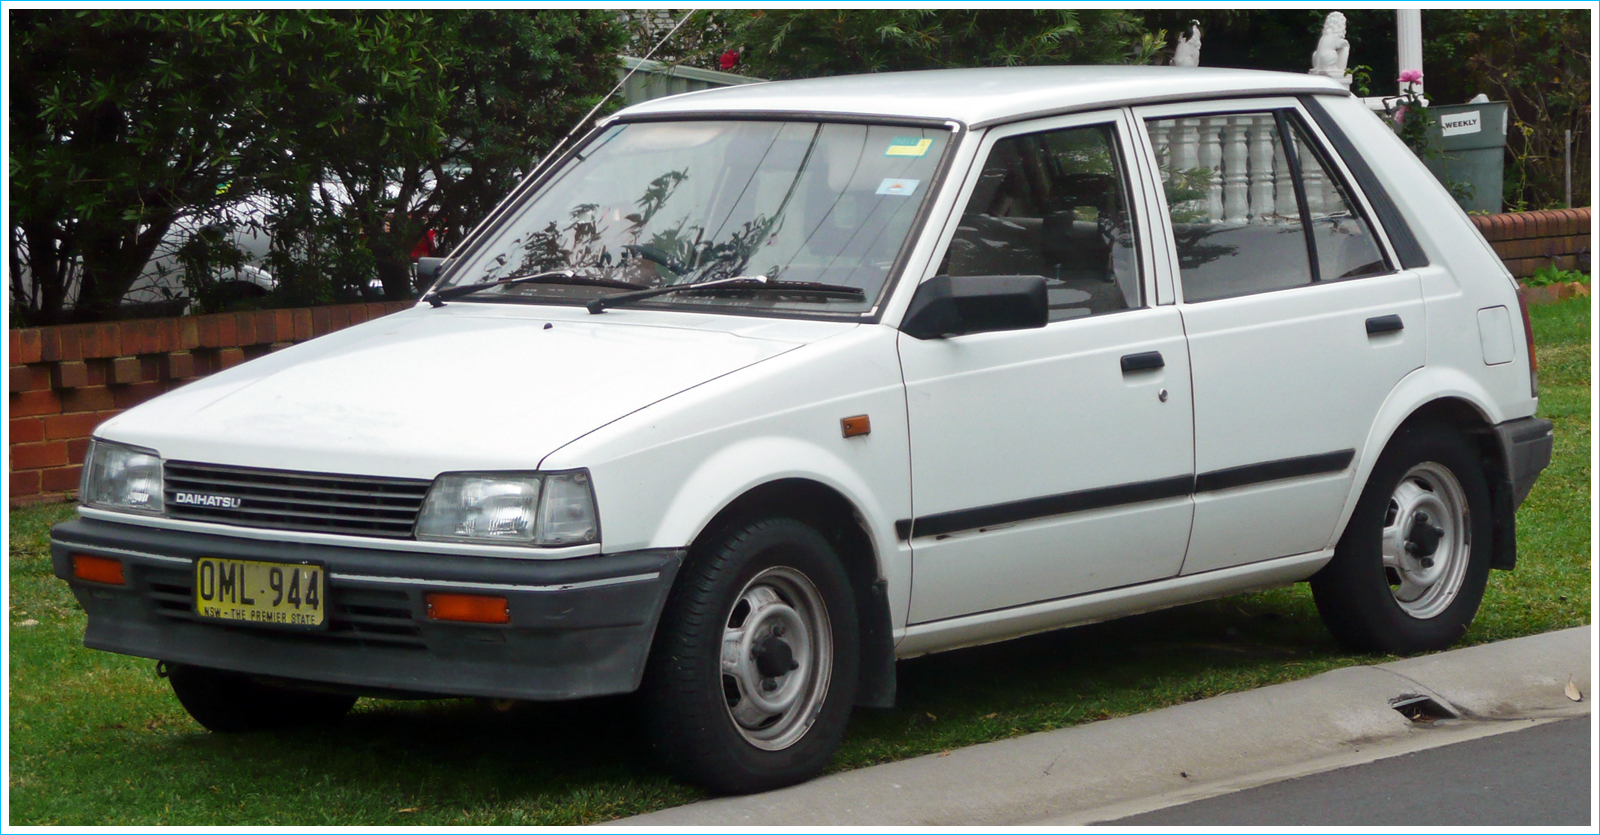 Mod U00e8le Populaire De Voiture Daihatsu